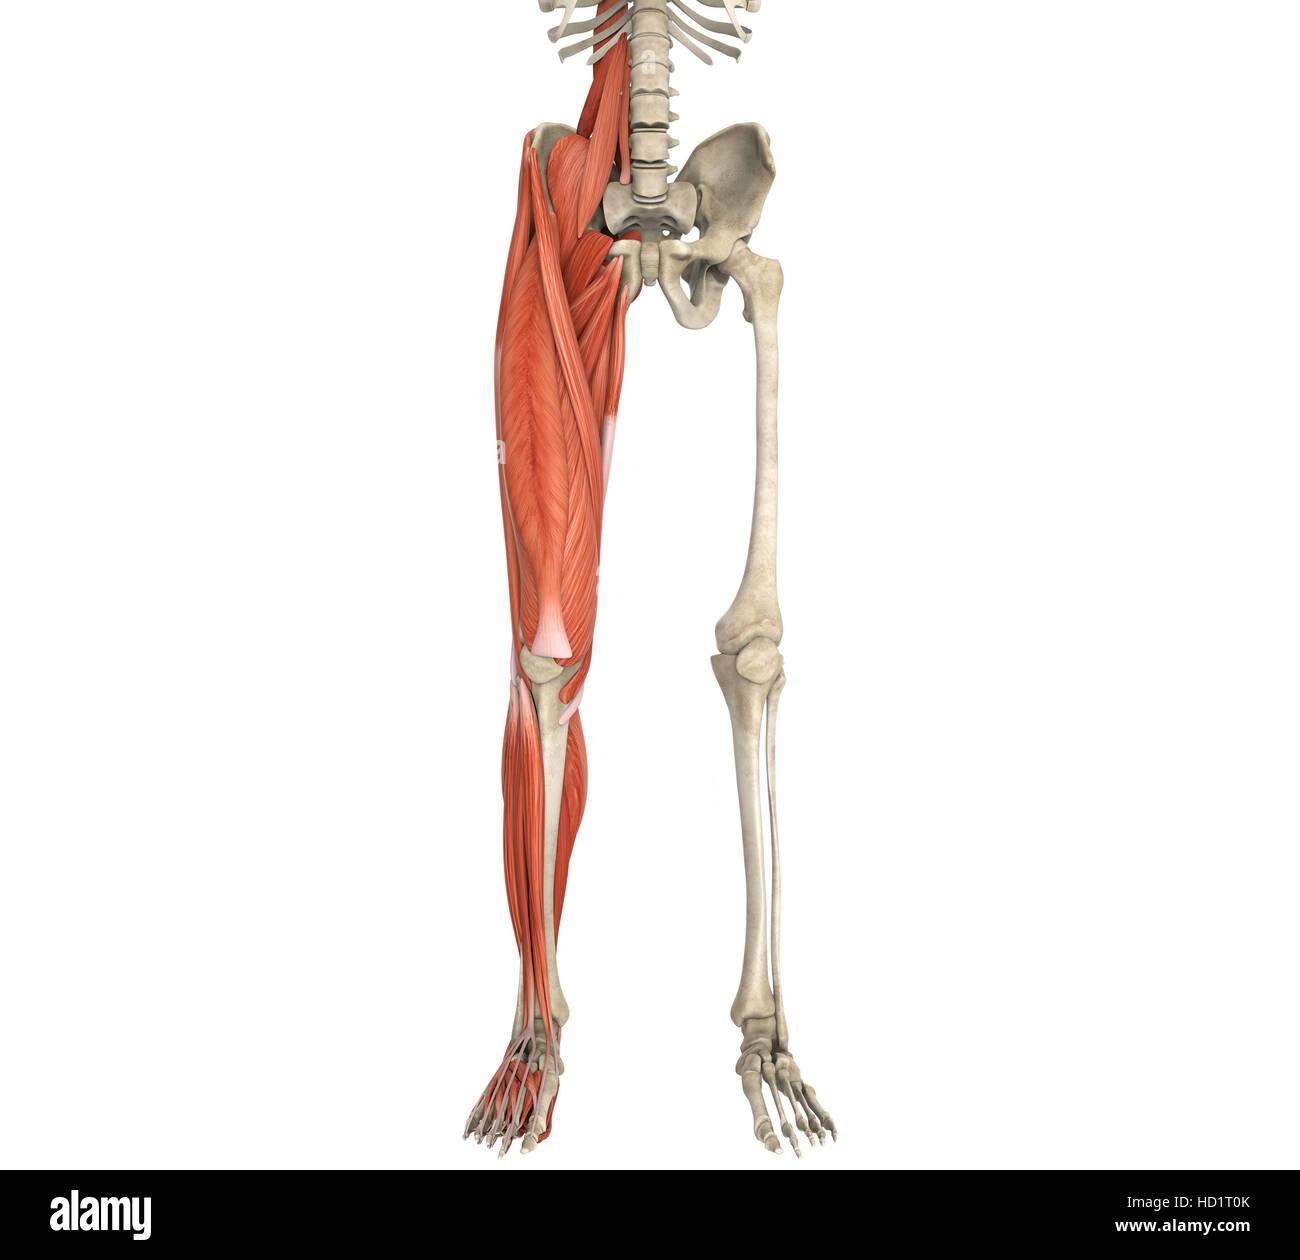 Beine Muskeln Anatomie Stockfoto, Bild: 128503891 - Alamy